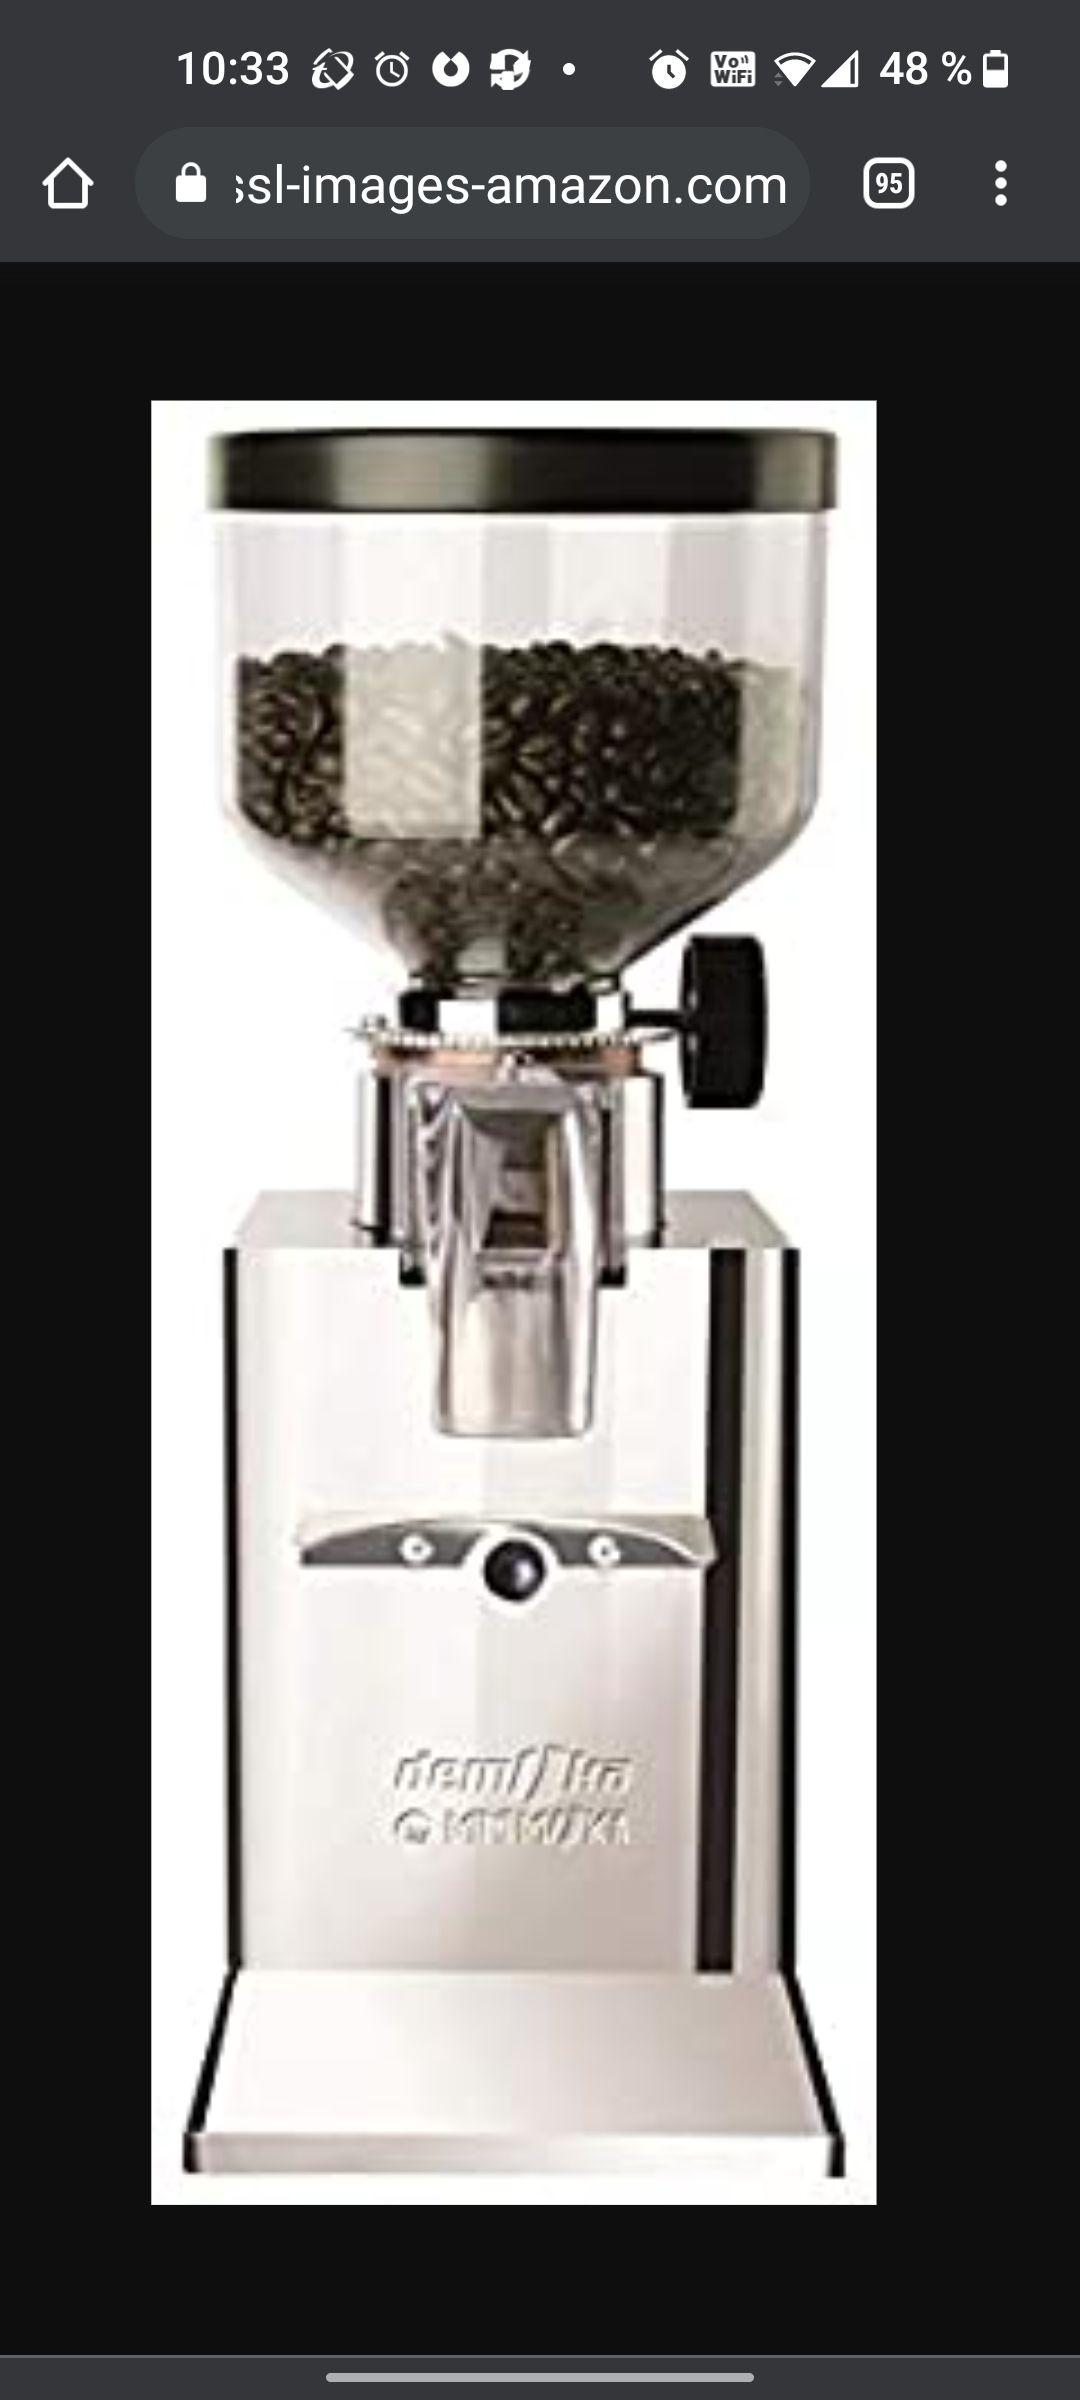 Espresso-Mühle Demoka 203 bei amazon.fr